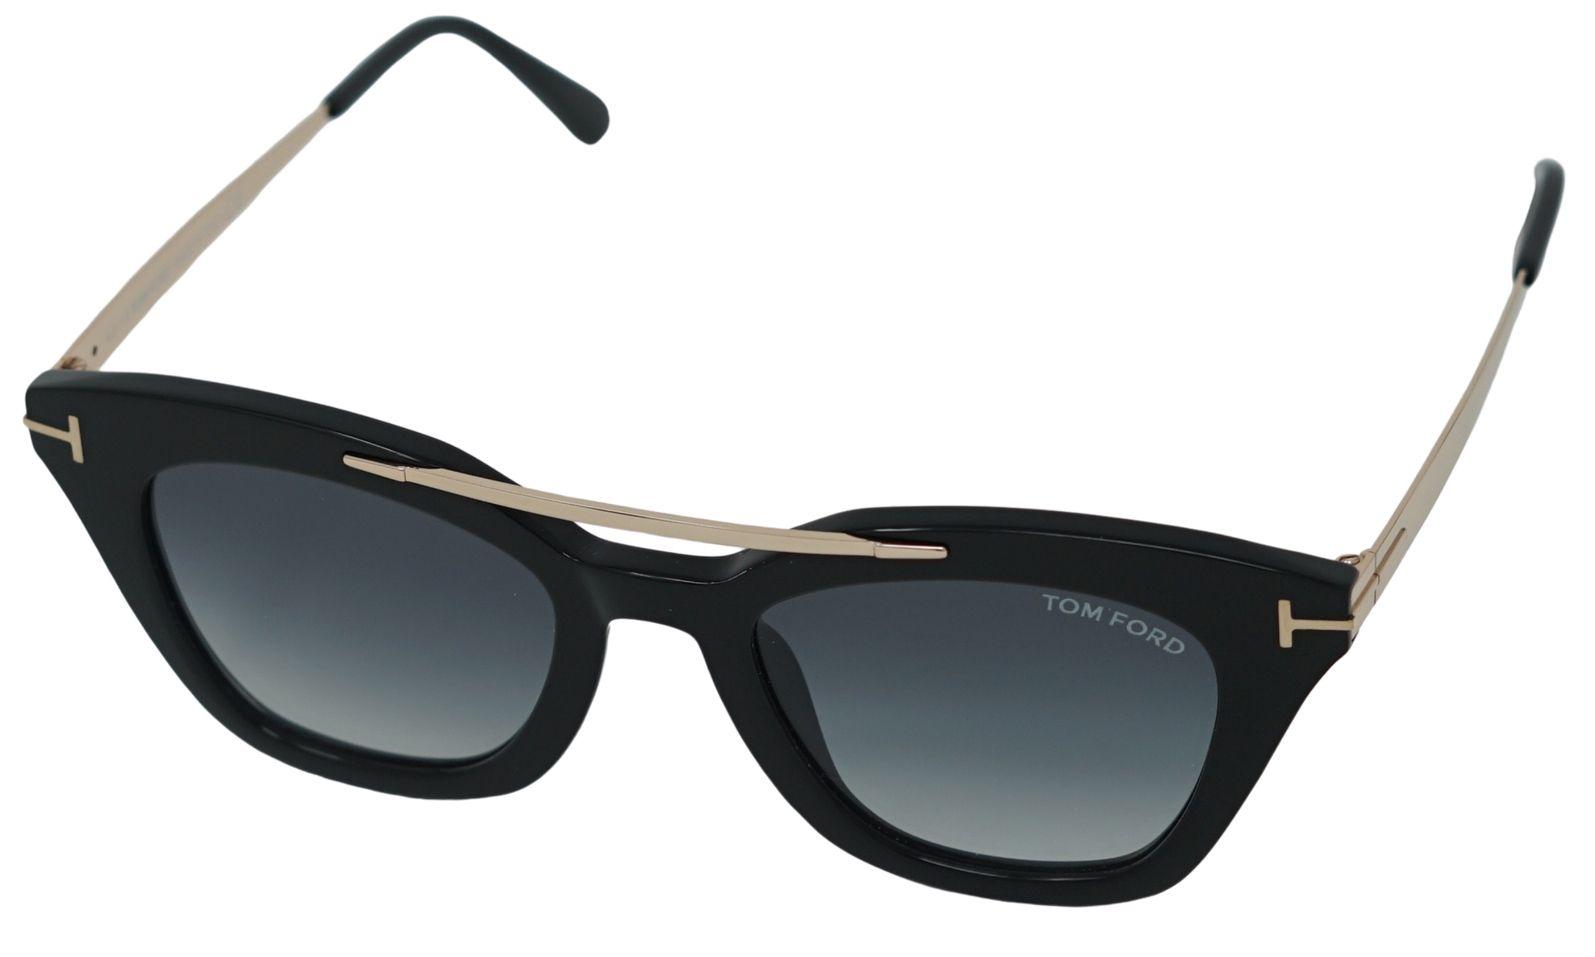 Tom Ford Anna Sunglasses FT0575 01B